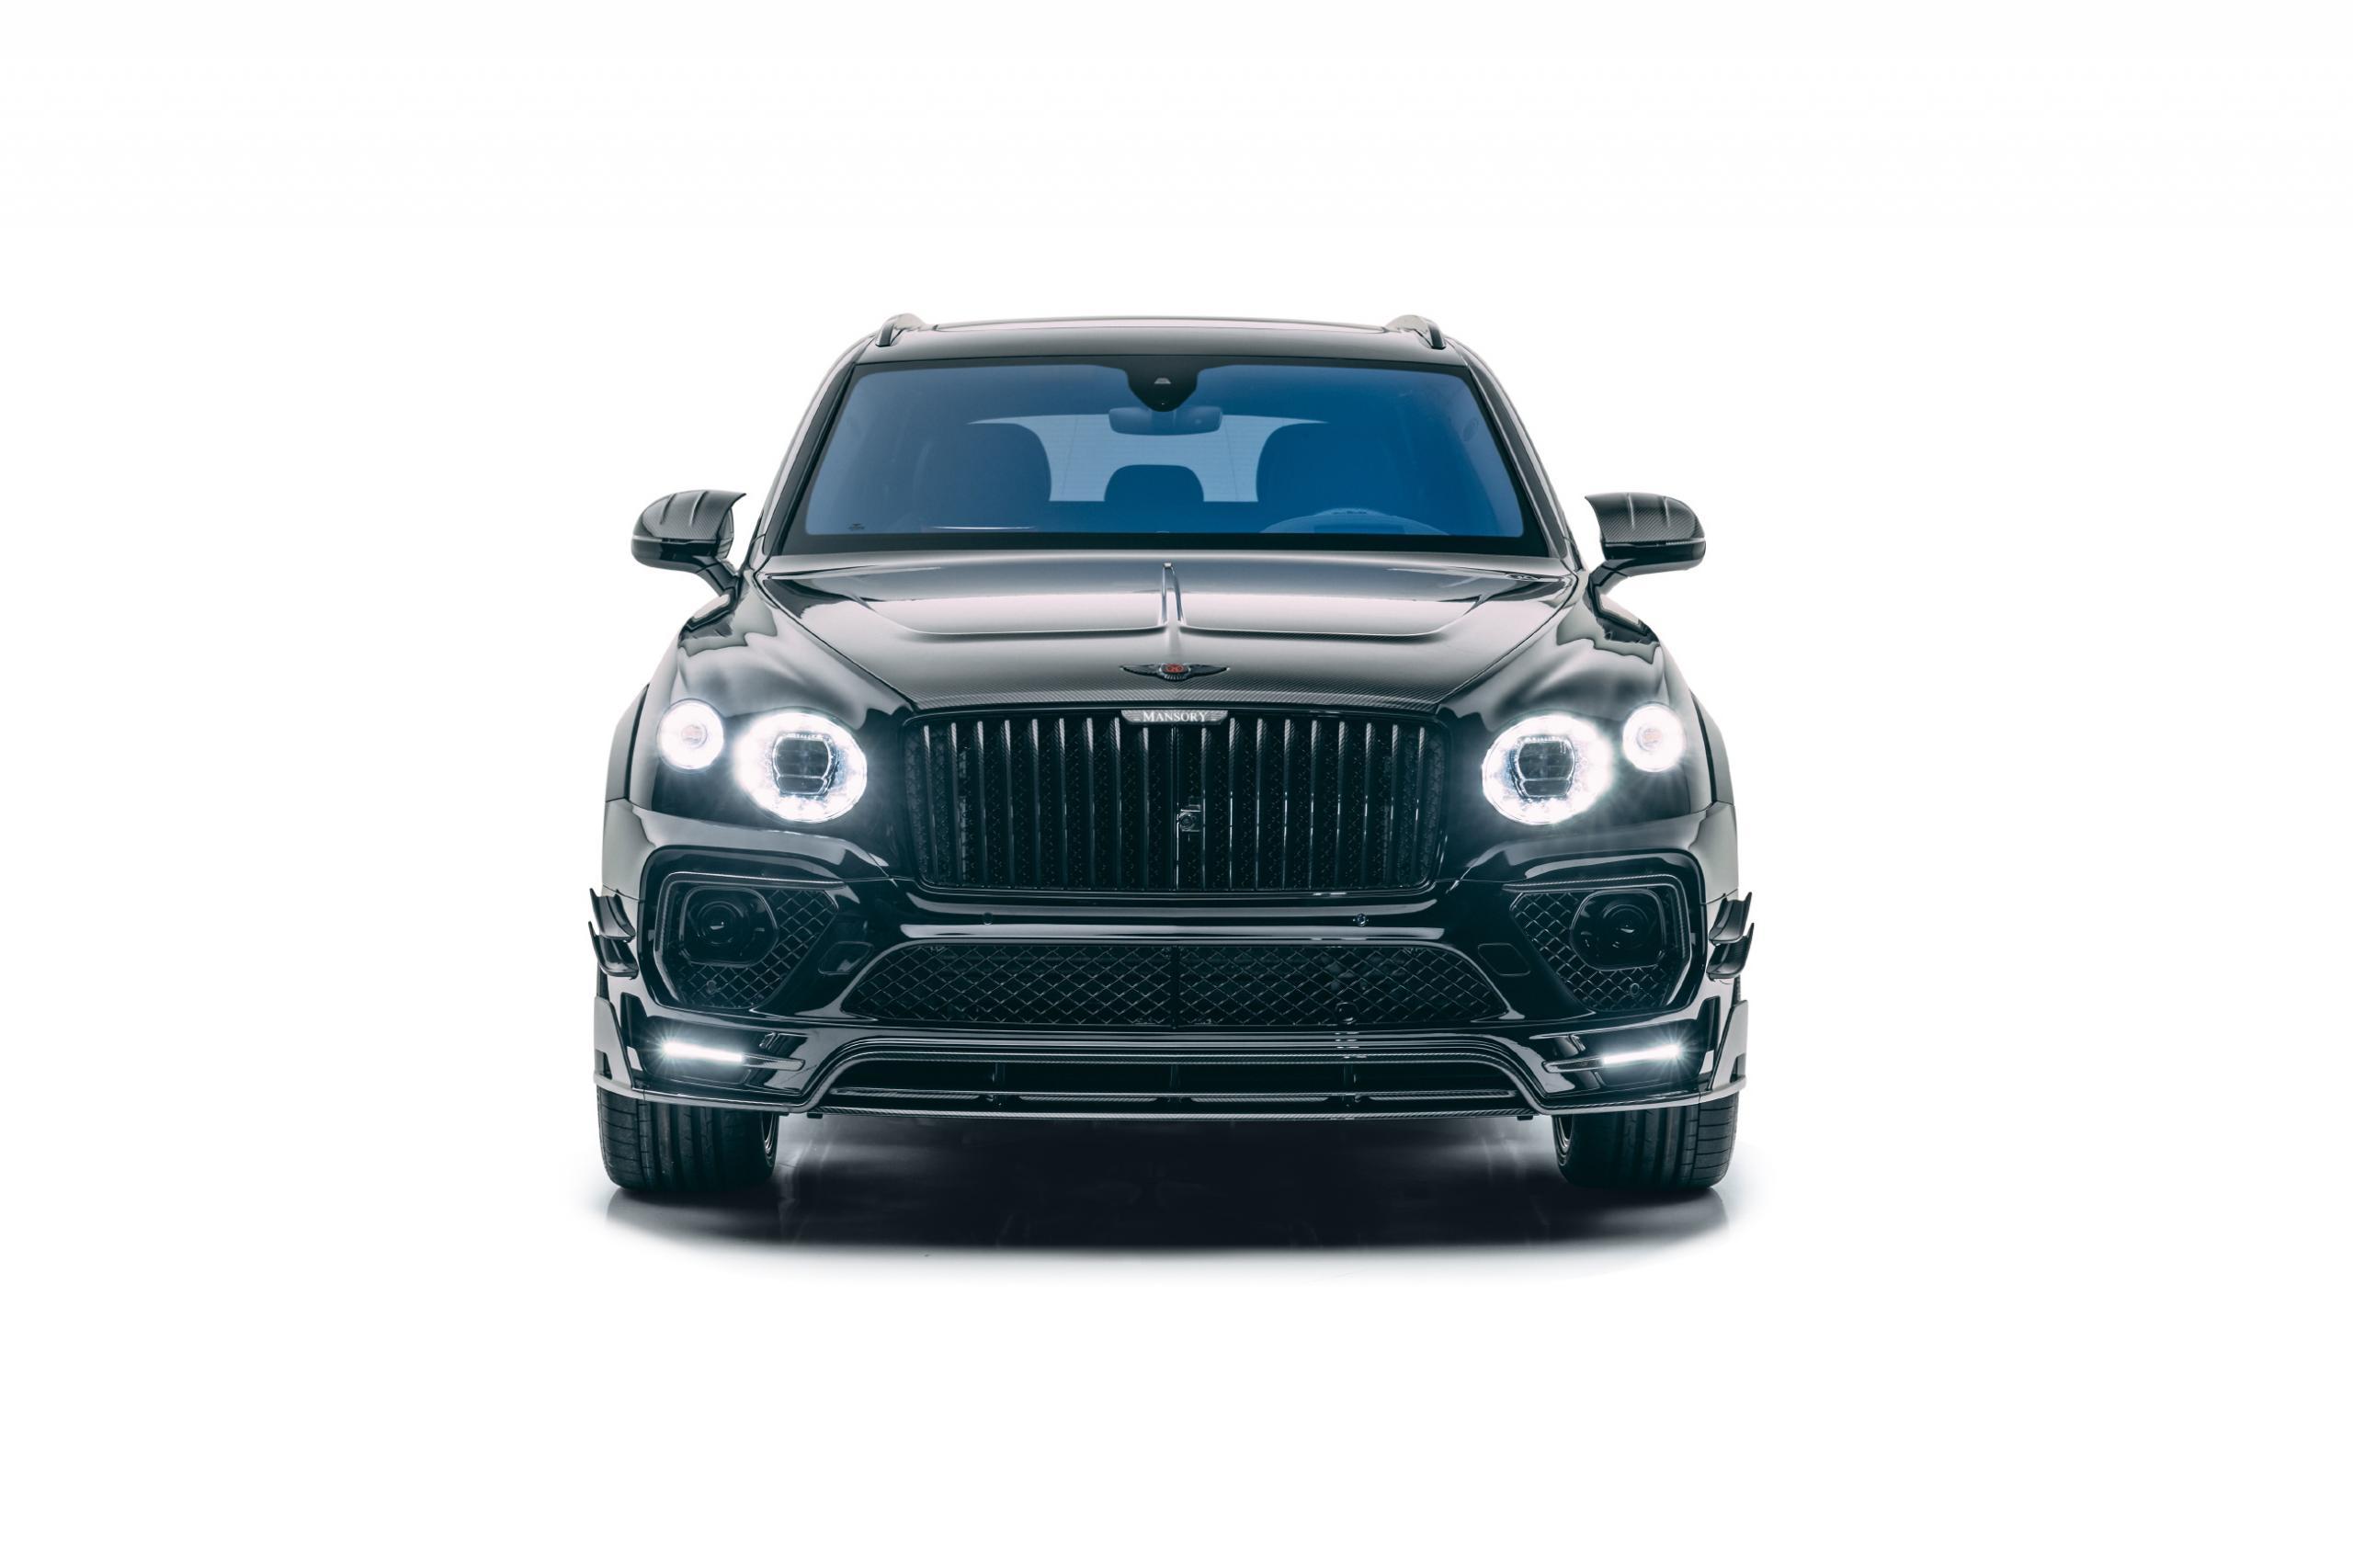 mansory new bentayga wide body kit carbon fiber front bumper led drl hood 2021